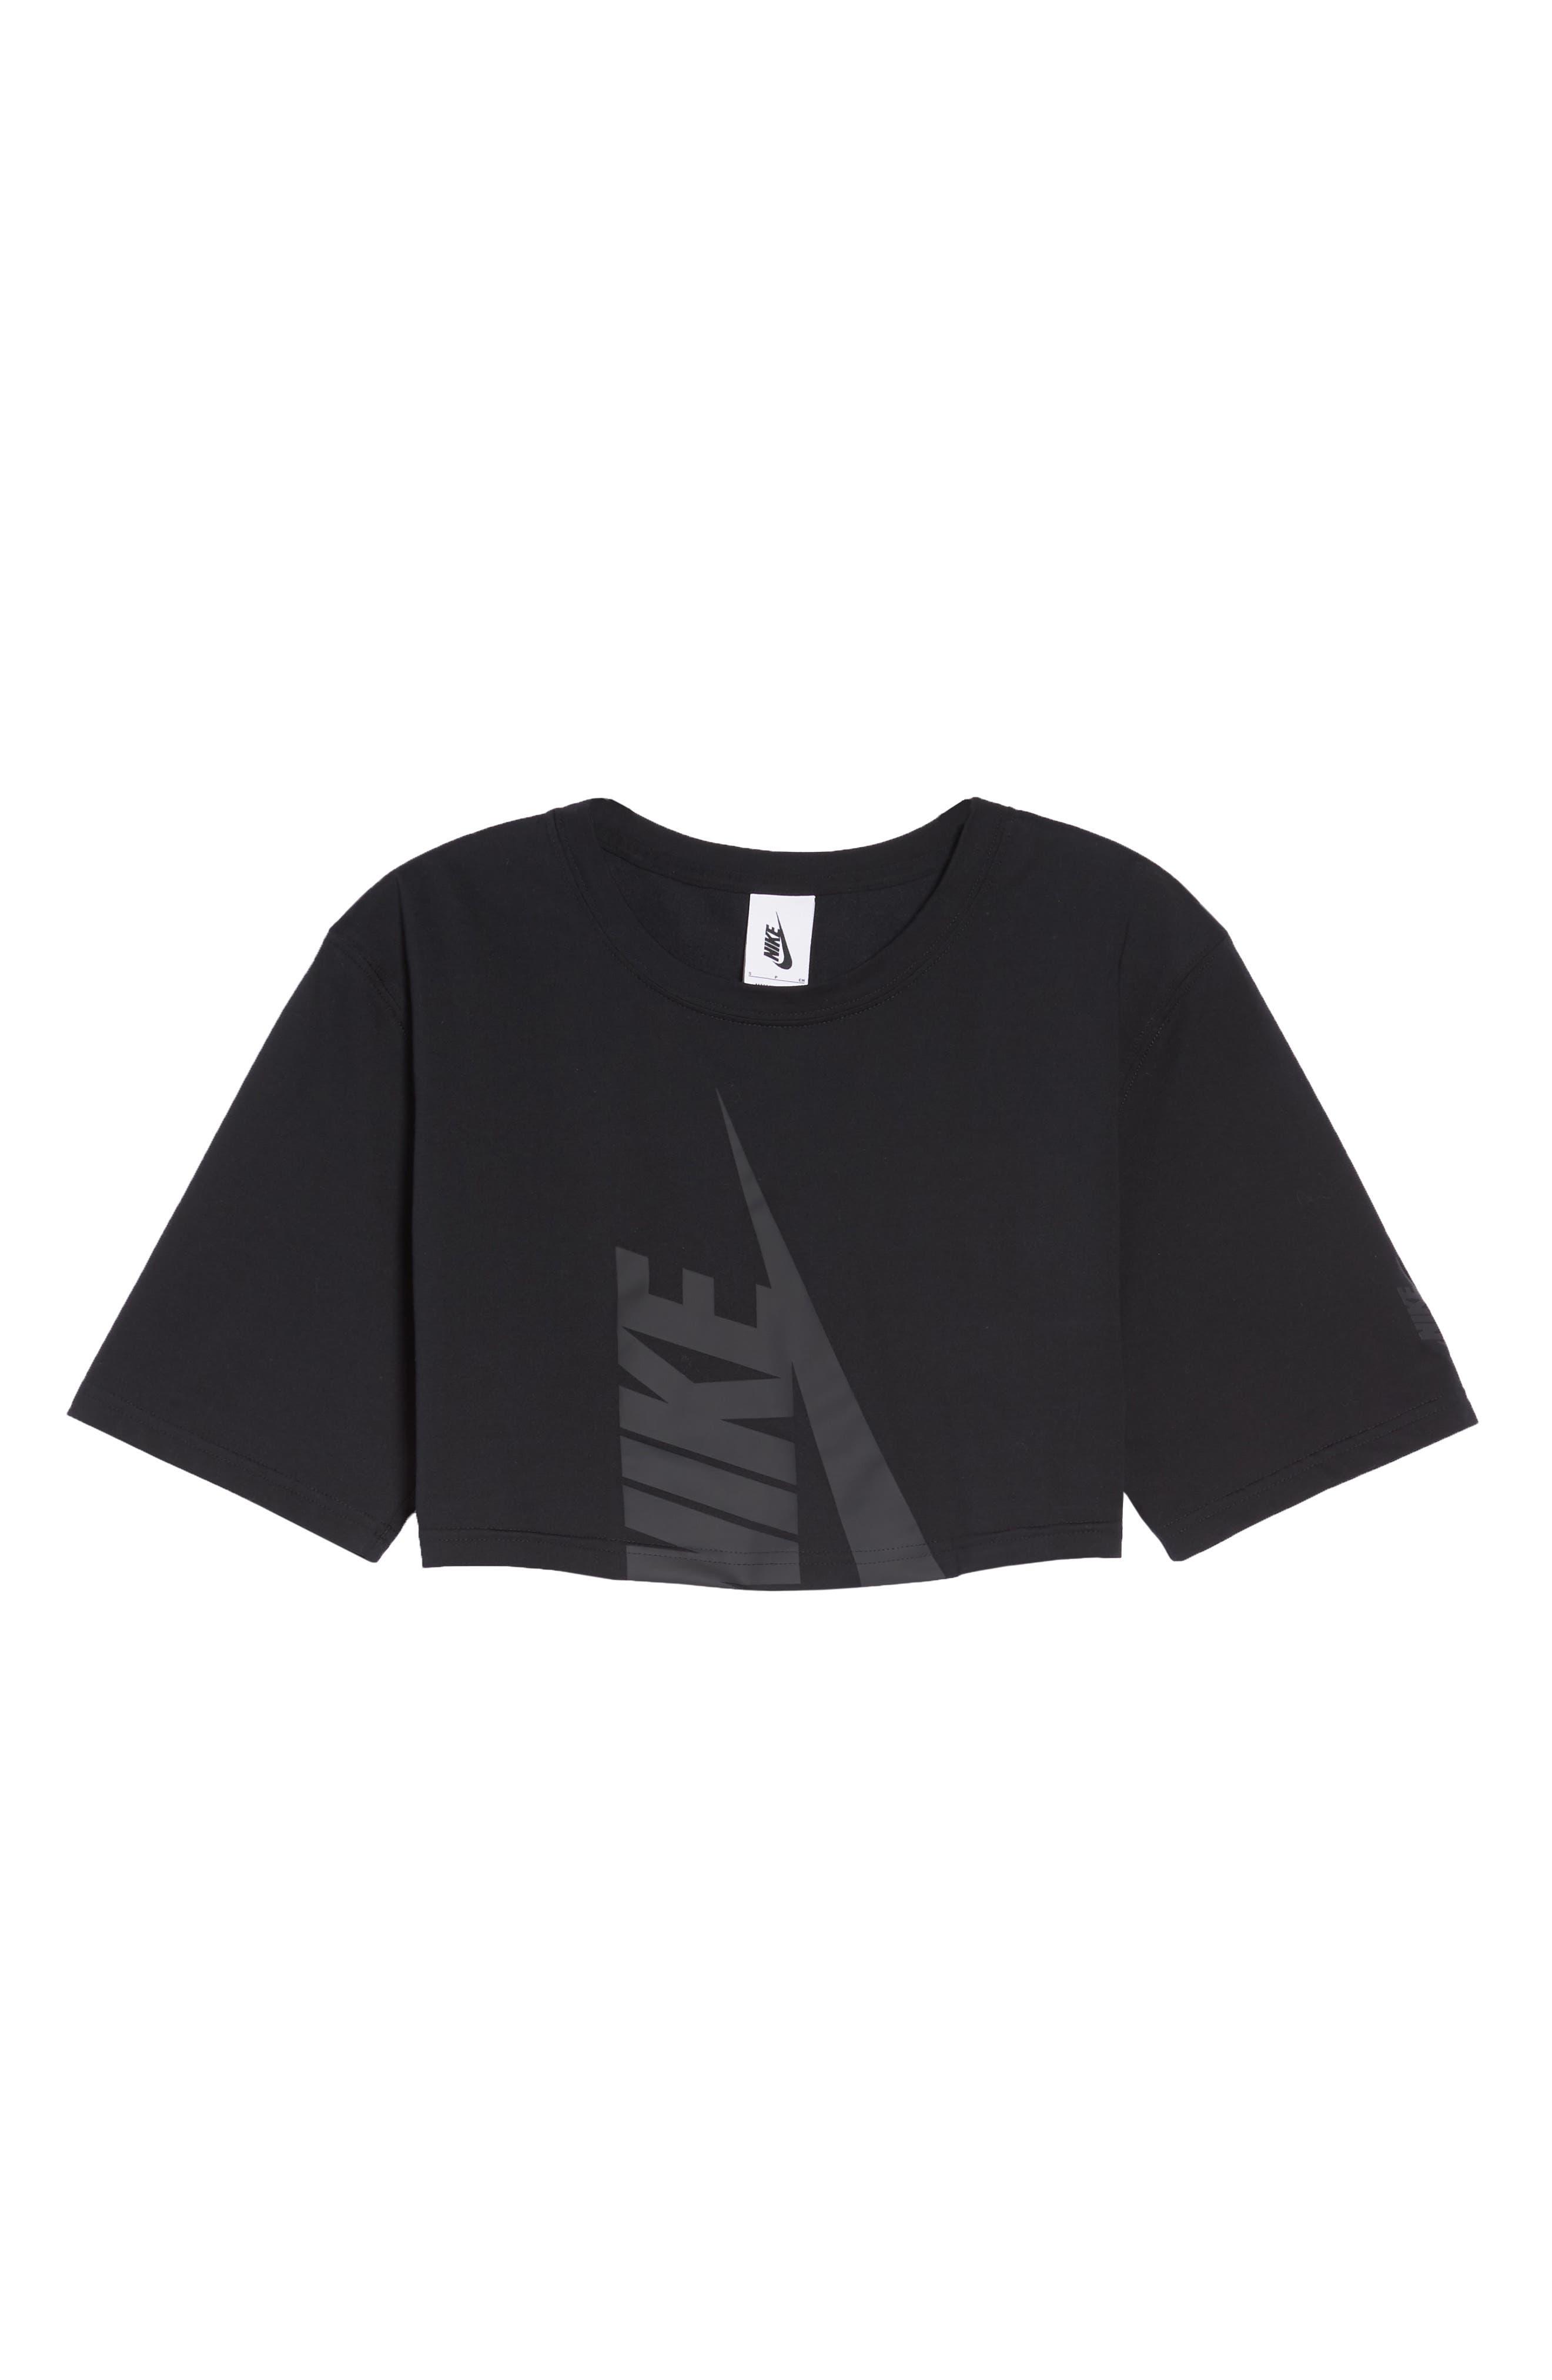 NikeLab Collection Jersey Crop Top,                             Alternate thumbnail 7, color,                             BLACK/ BLACK